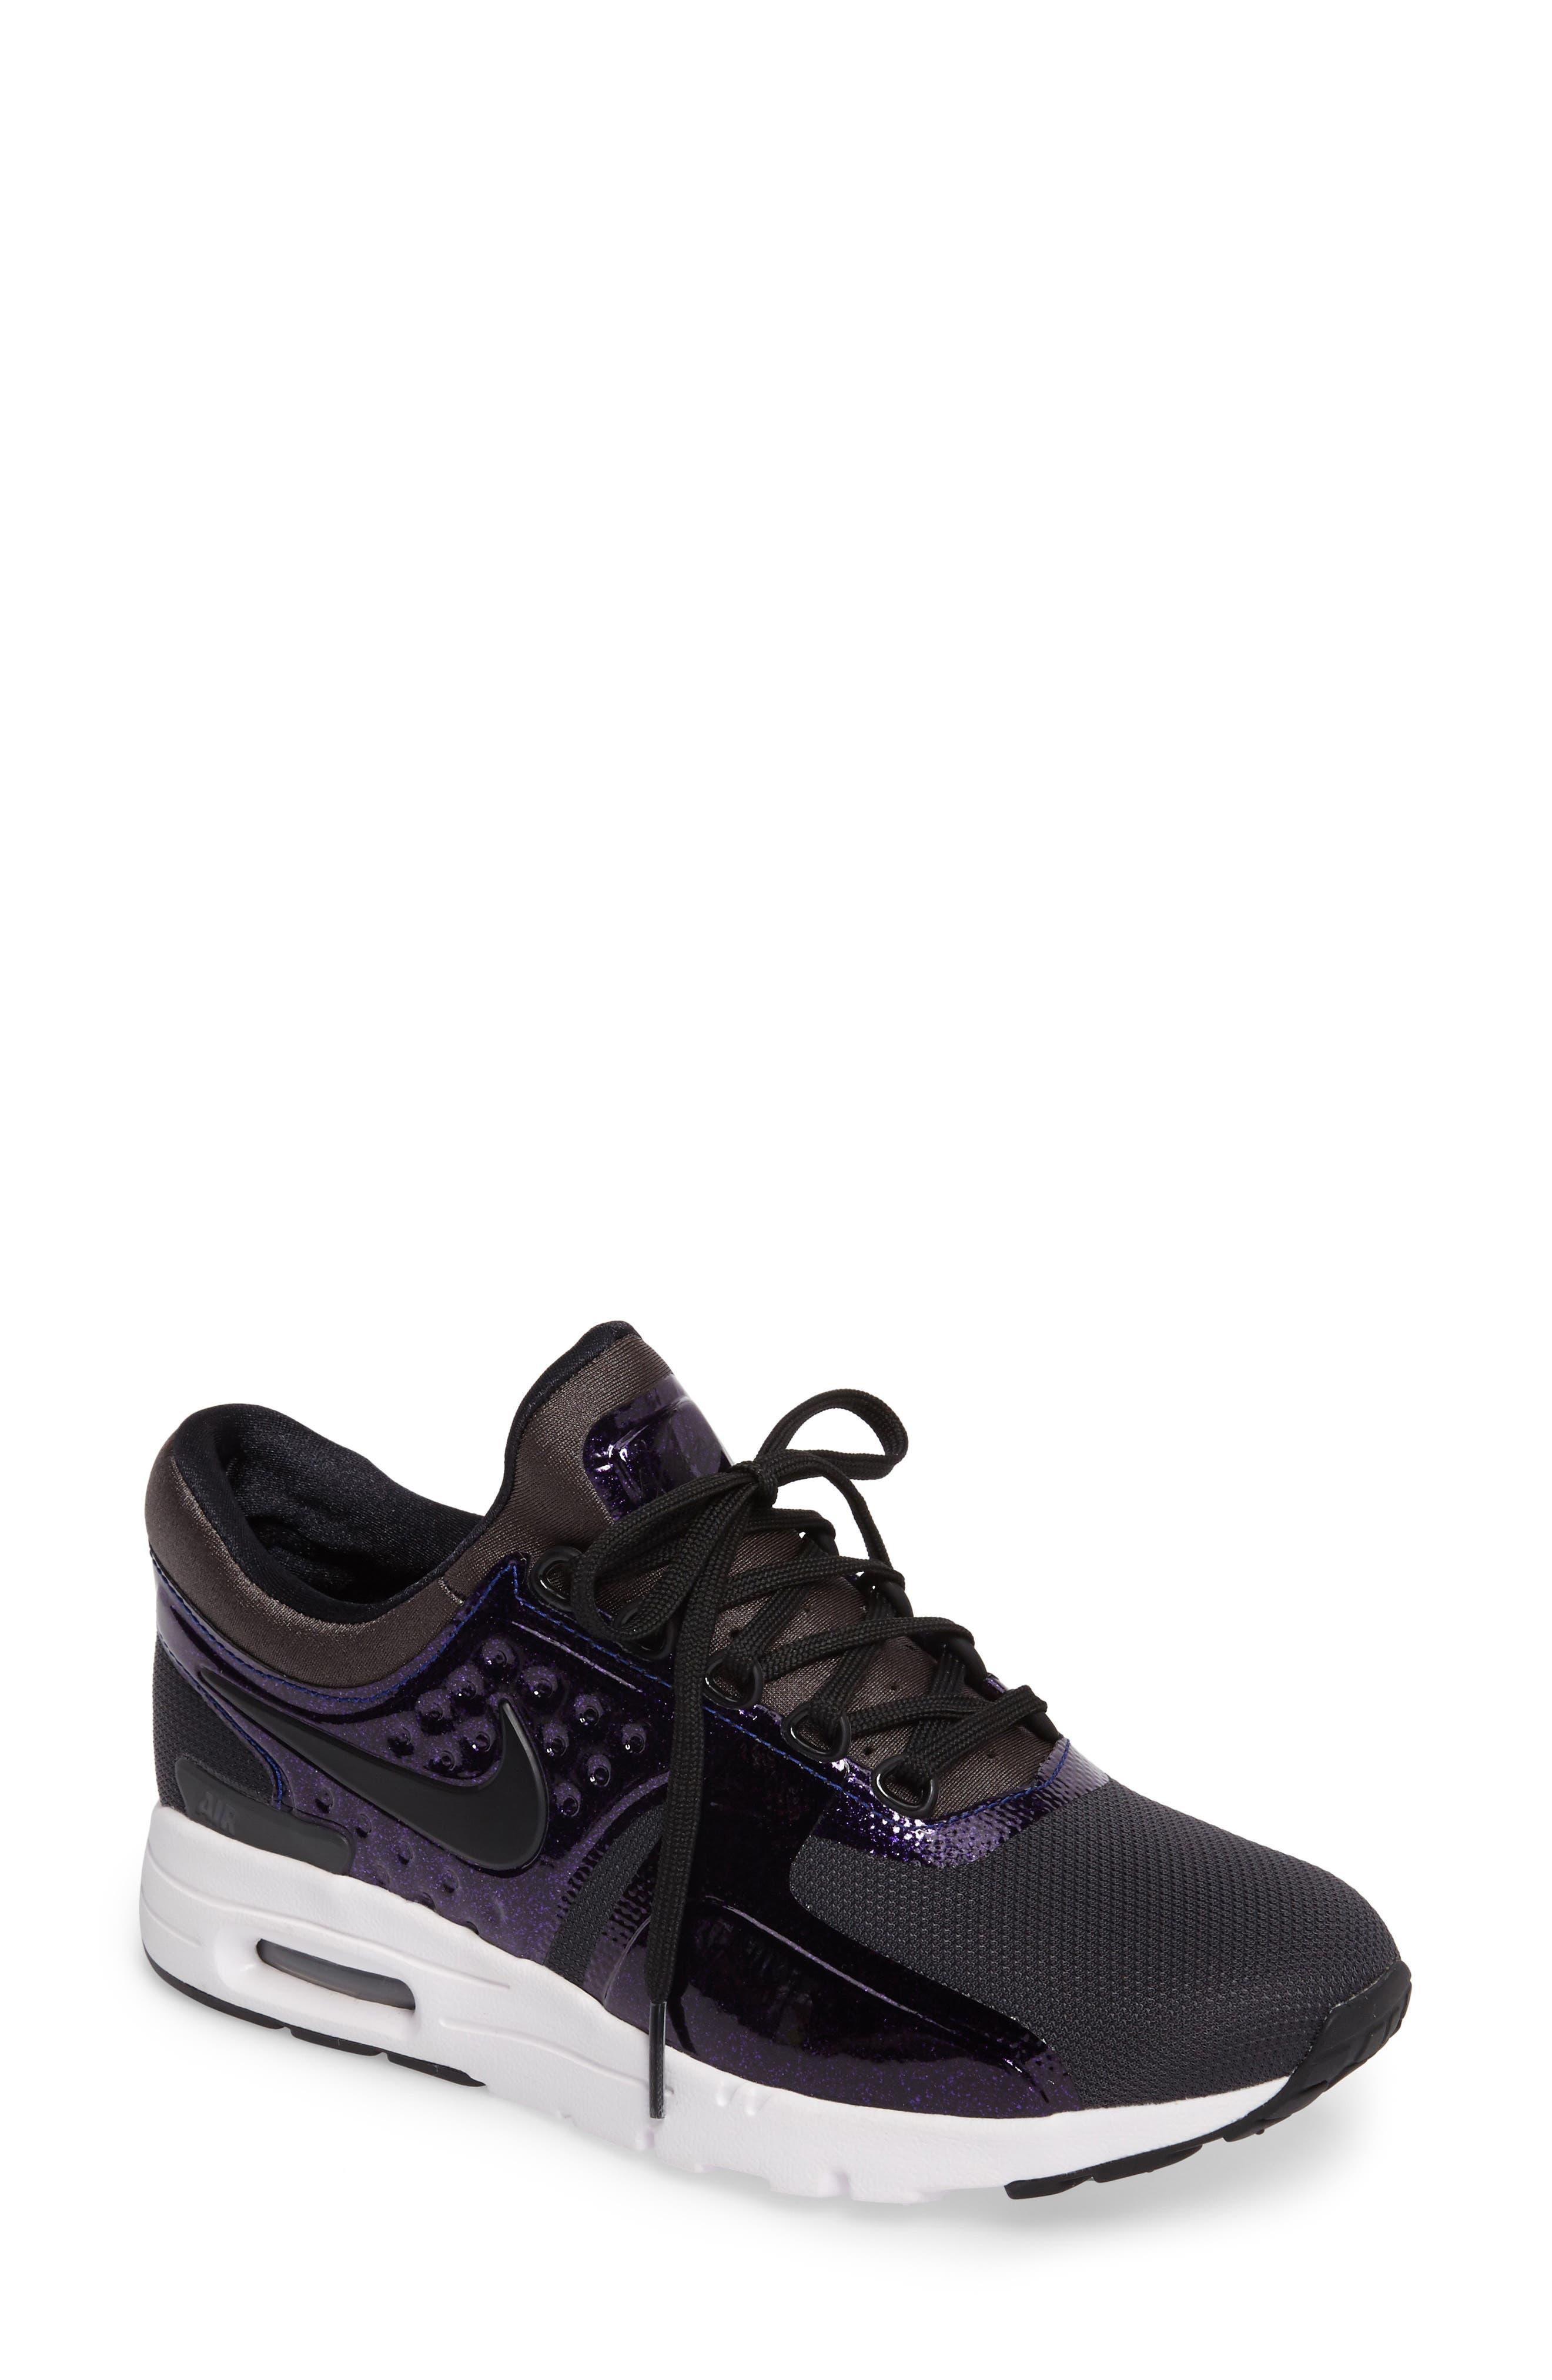 Nike Air Max 1 TD Cool GreyWhite LT Arctic Pink 807607 007